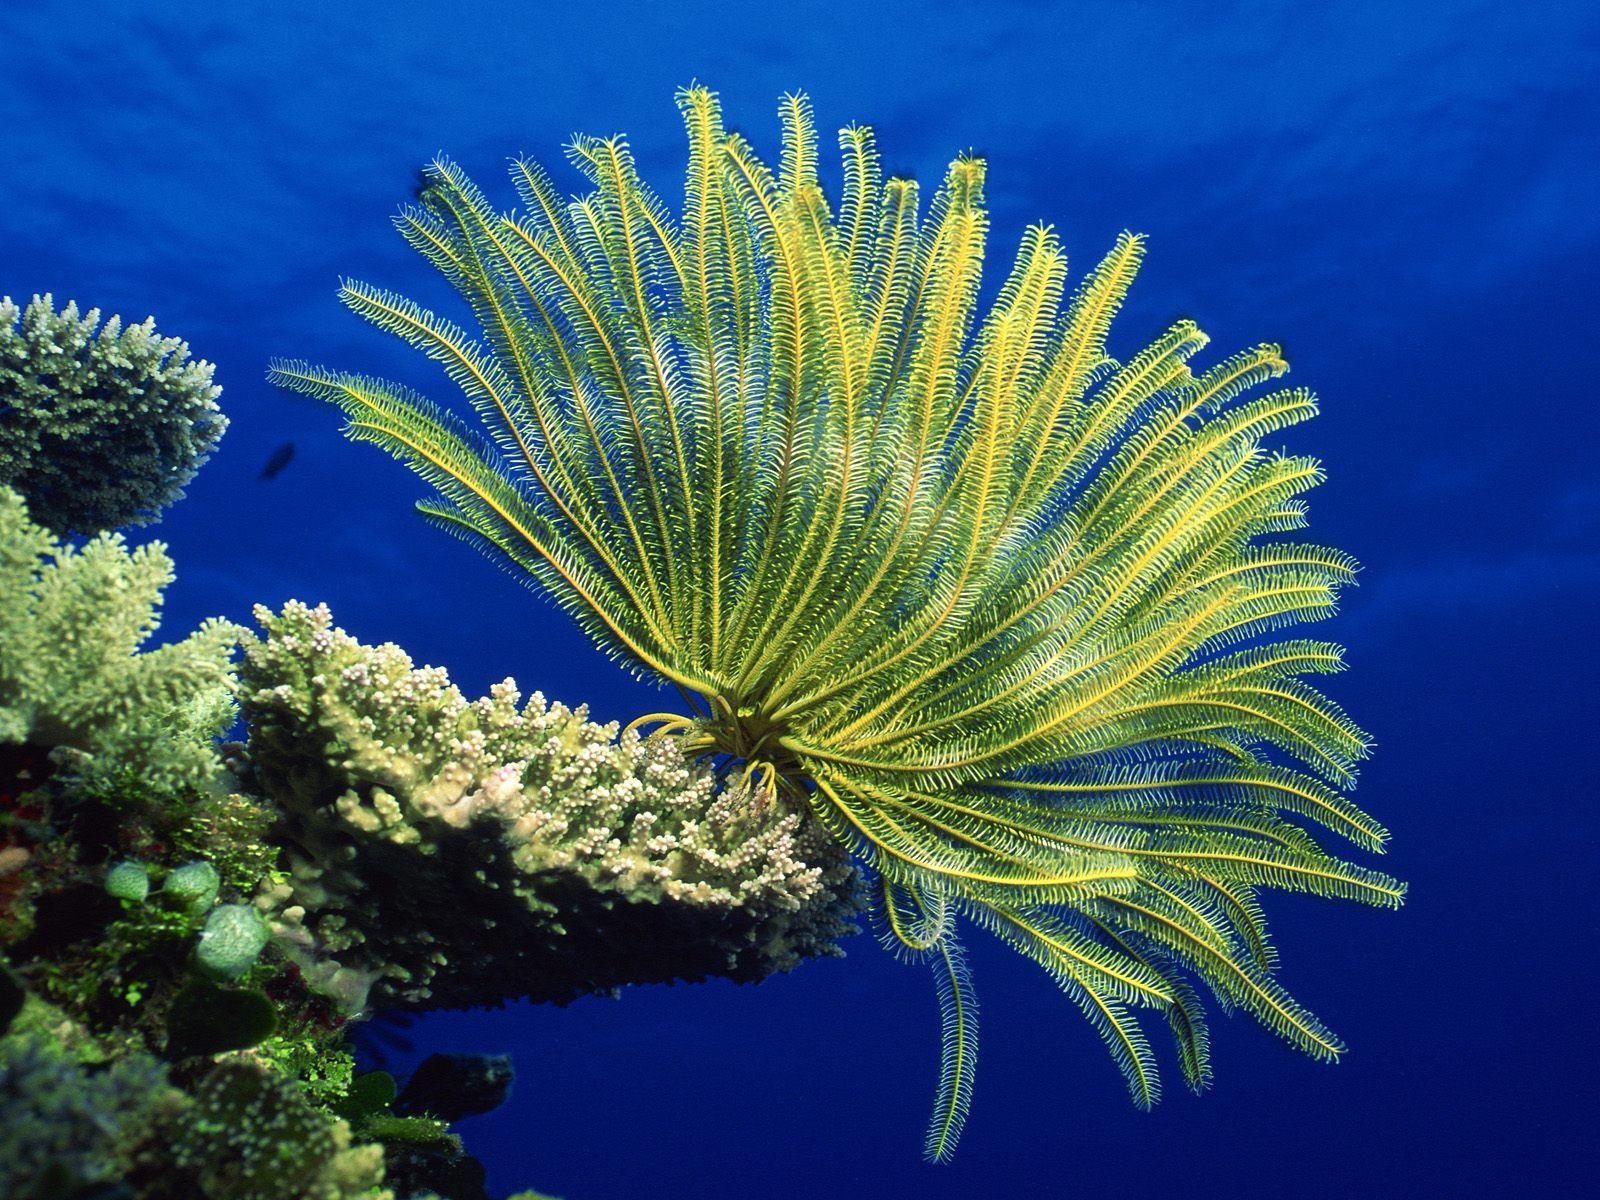 Crinoid Coral Sea HD dekstop wallpapers   Crinoid Coral Sea 1600x1200